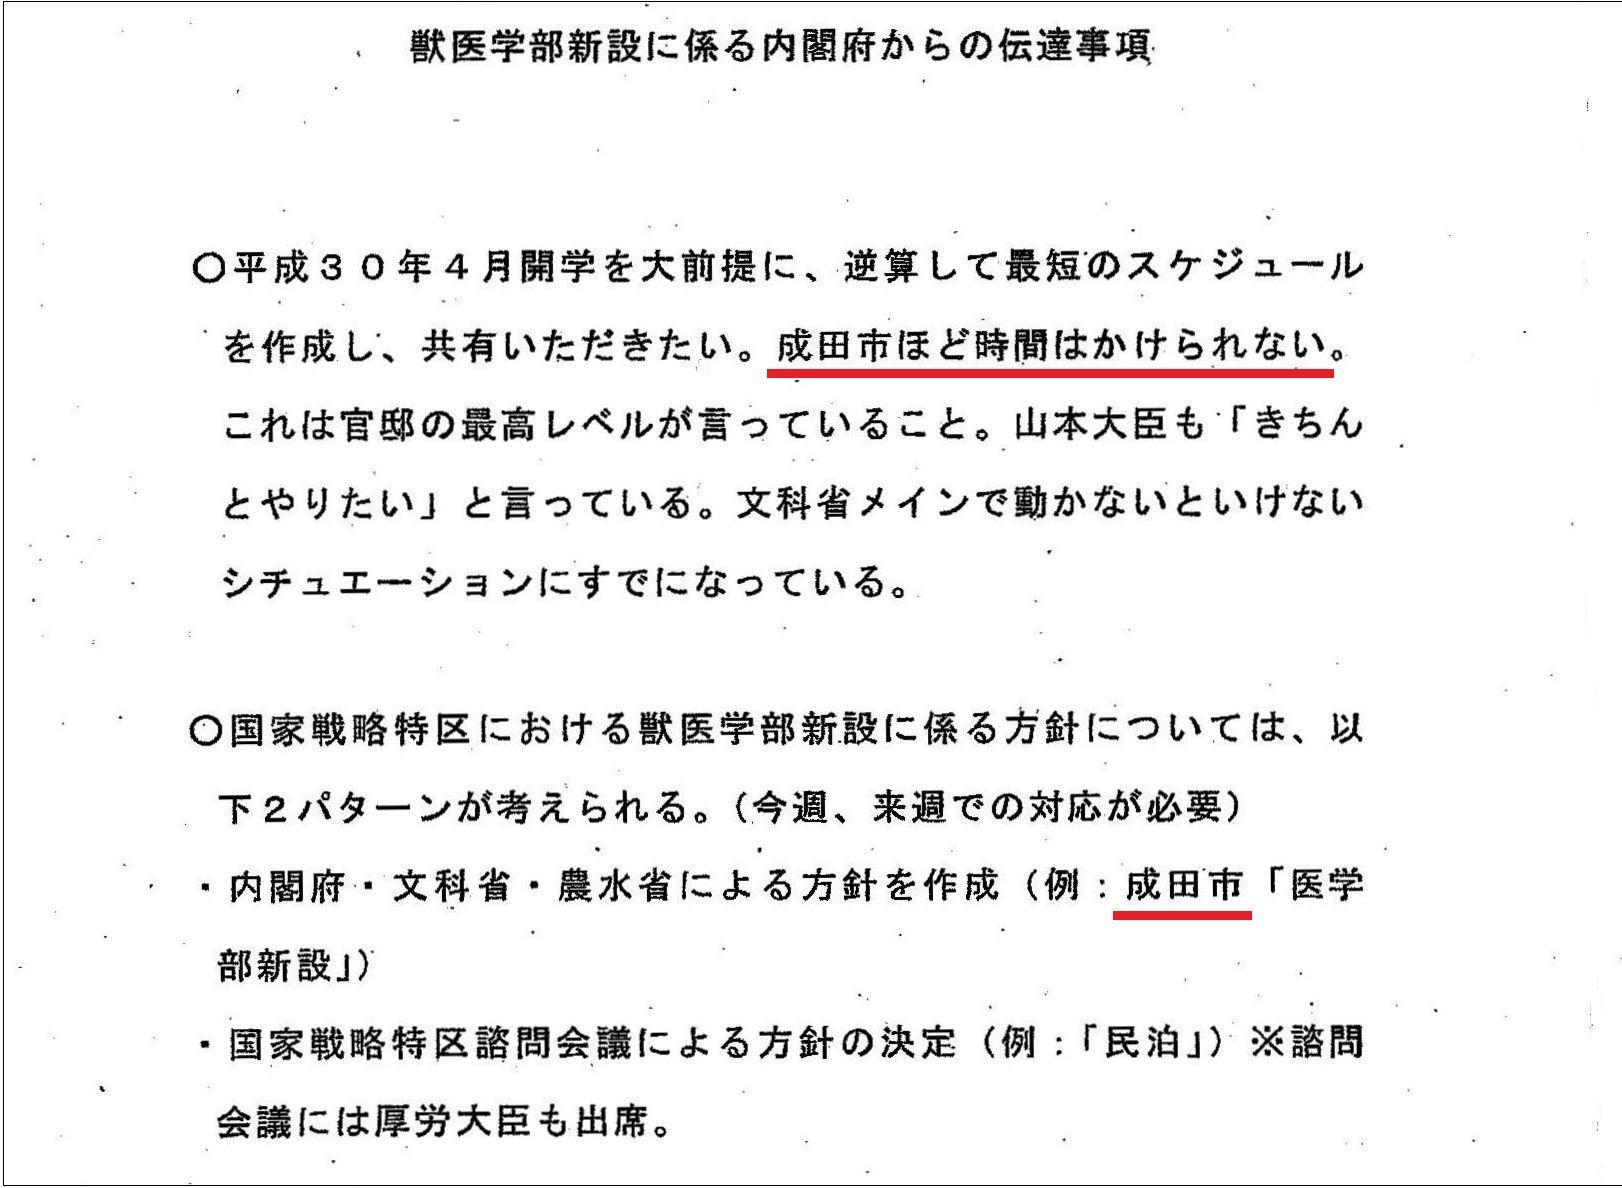 http://hunter-investigate.jp/news/047b1c6d278cf823c6ab26f7a1072abb8e242b9c.jpg